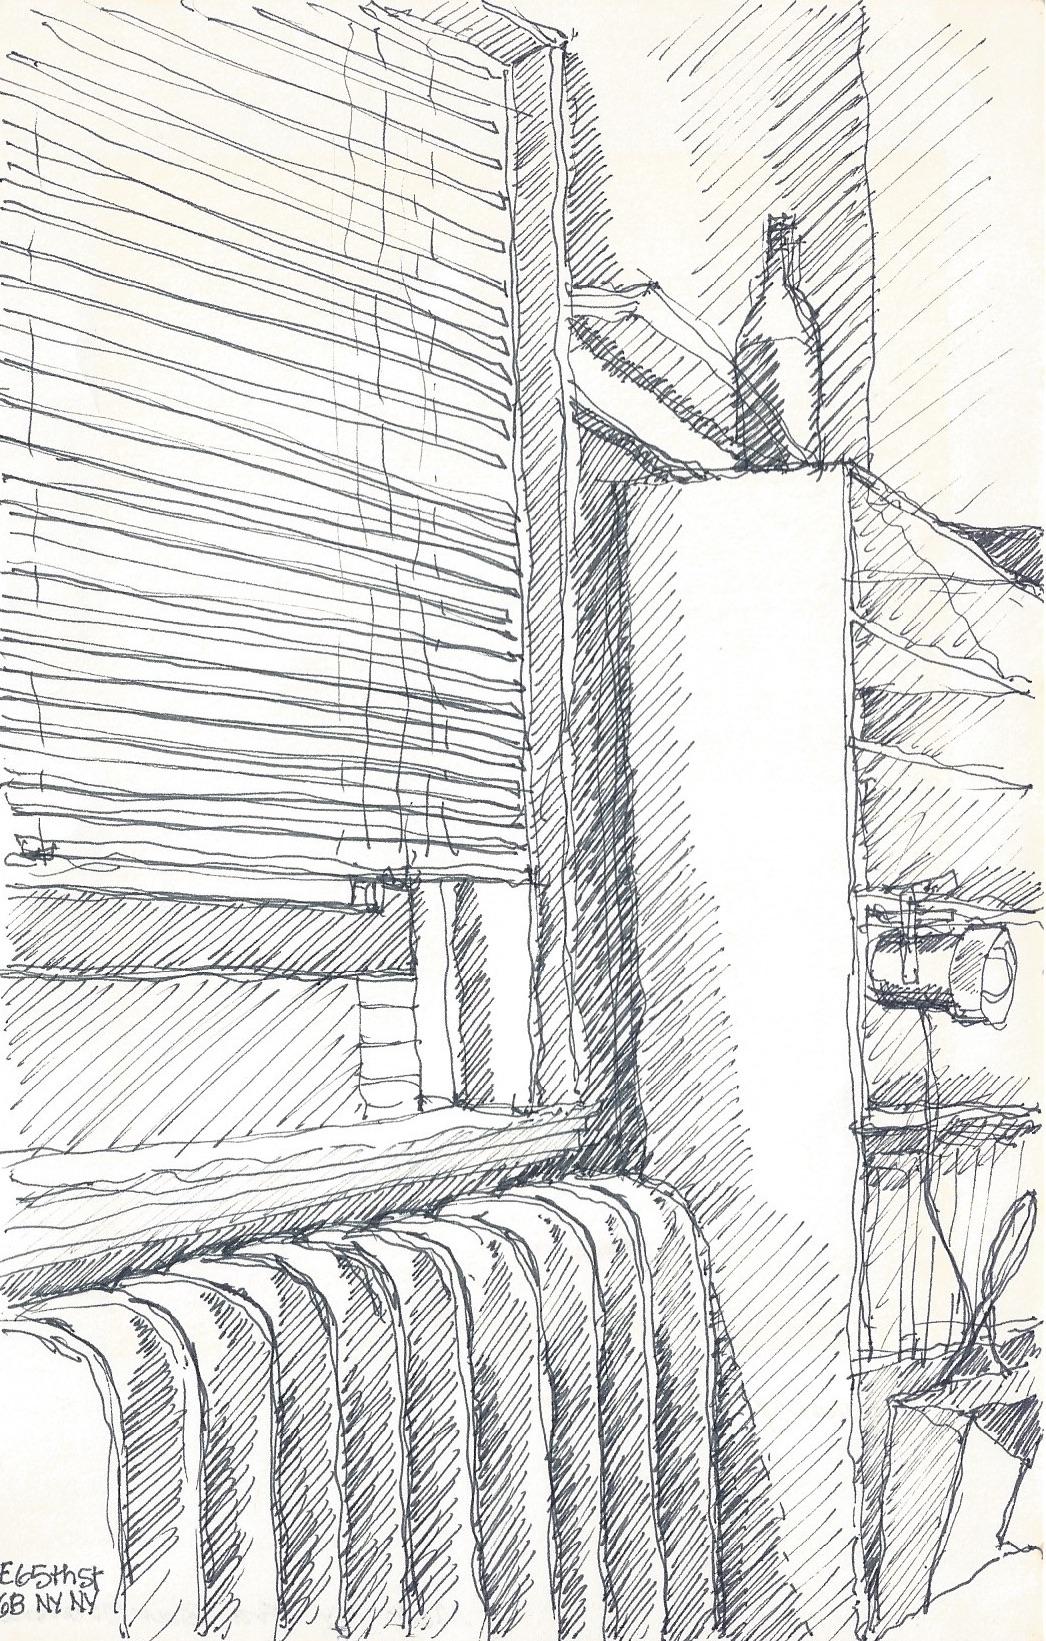 Sketch of a corner of my New York walk-up.